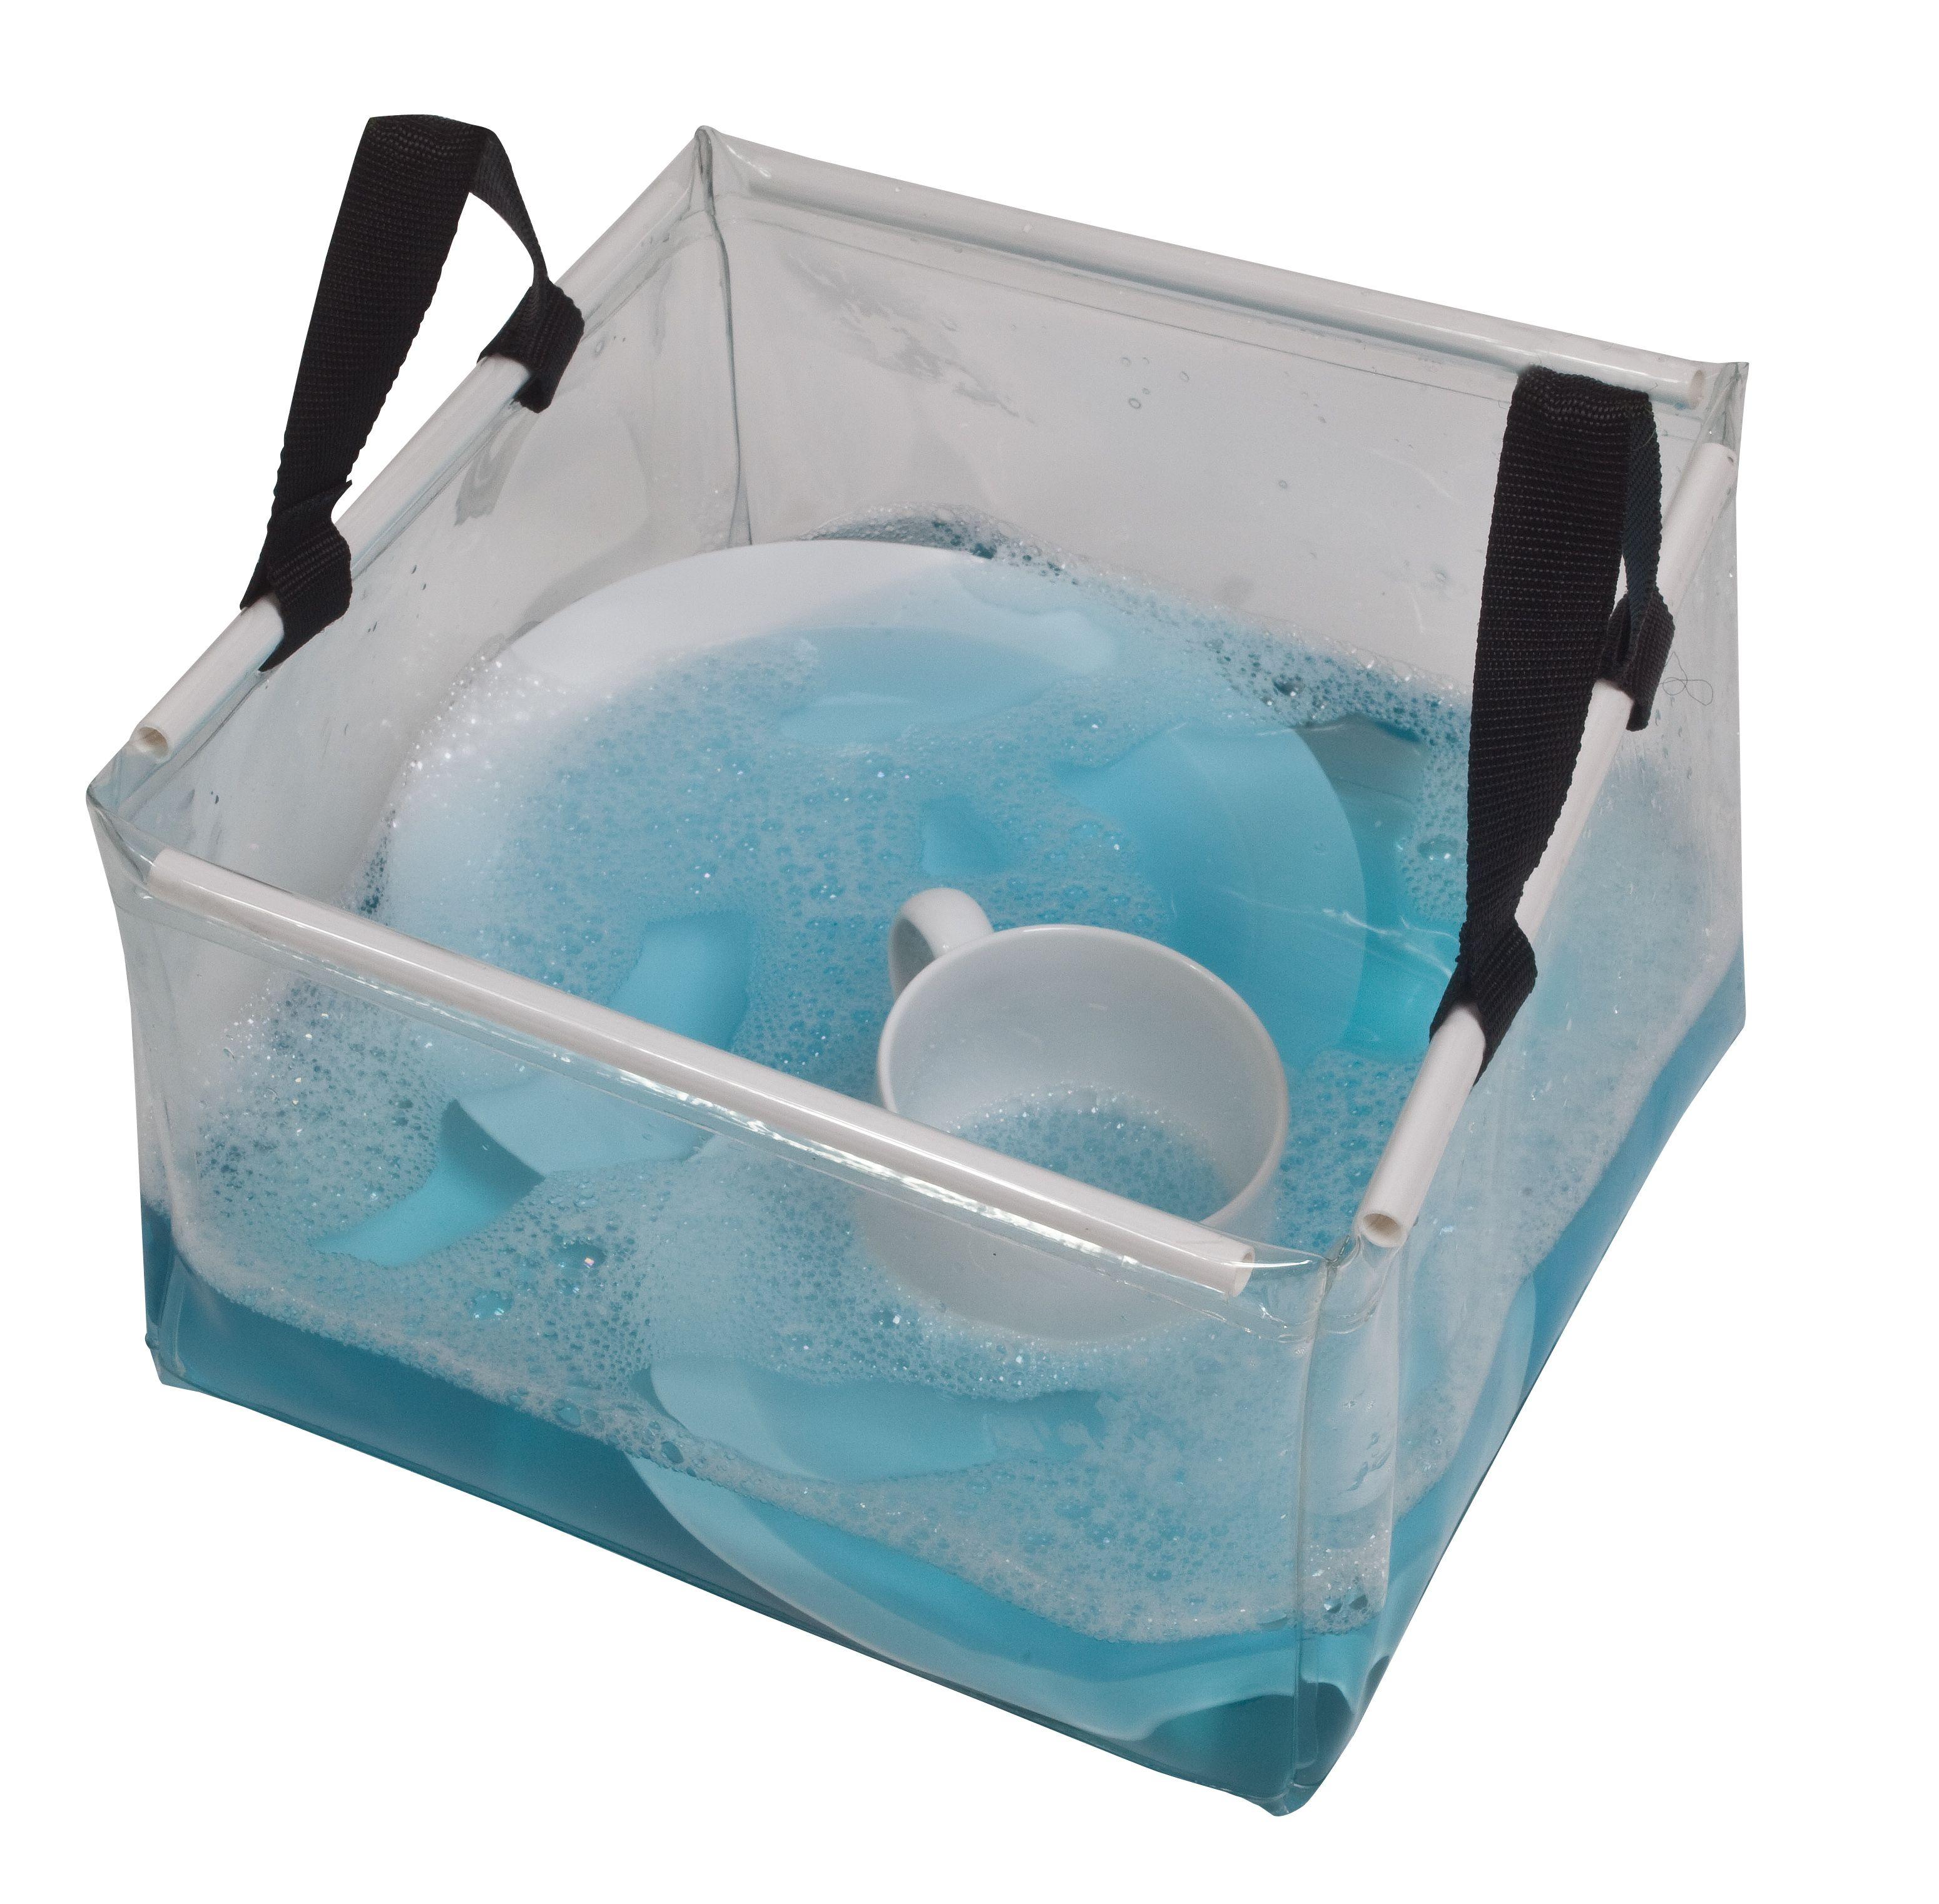 Laundry Bowl : Kampa Collapsible Washing Bowl - Aztec Leisure